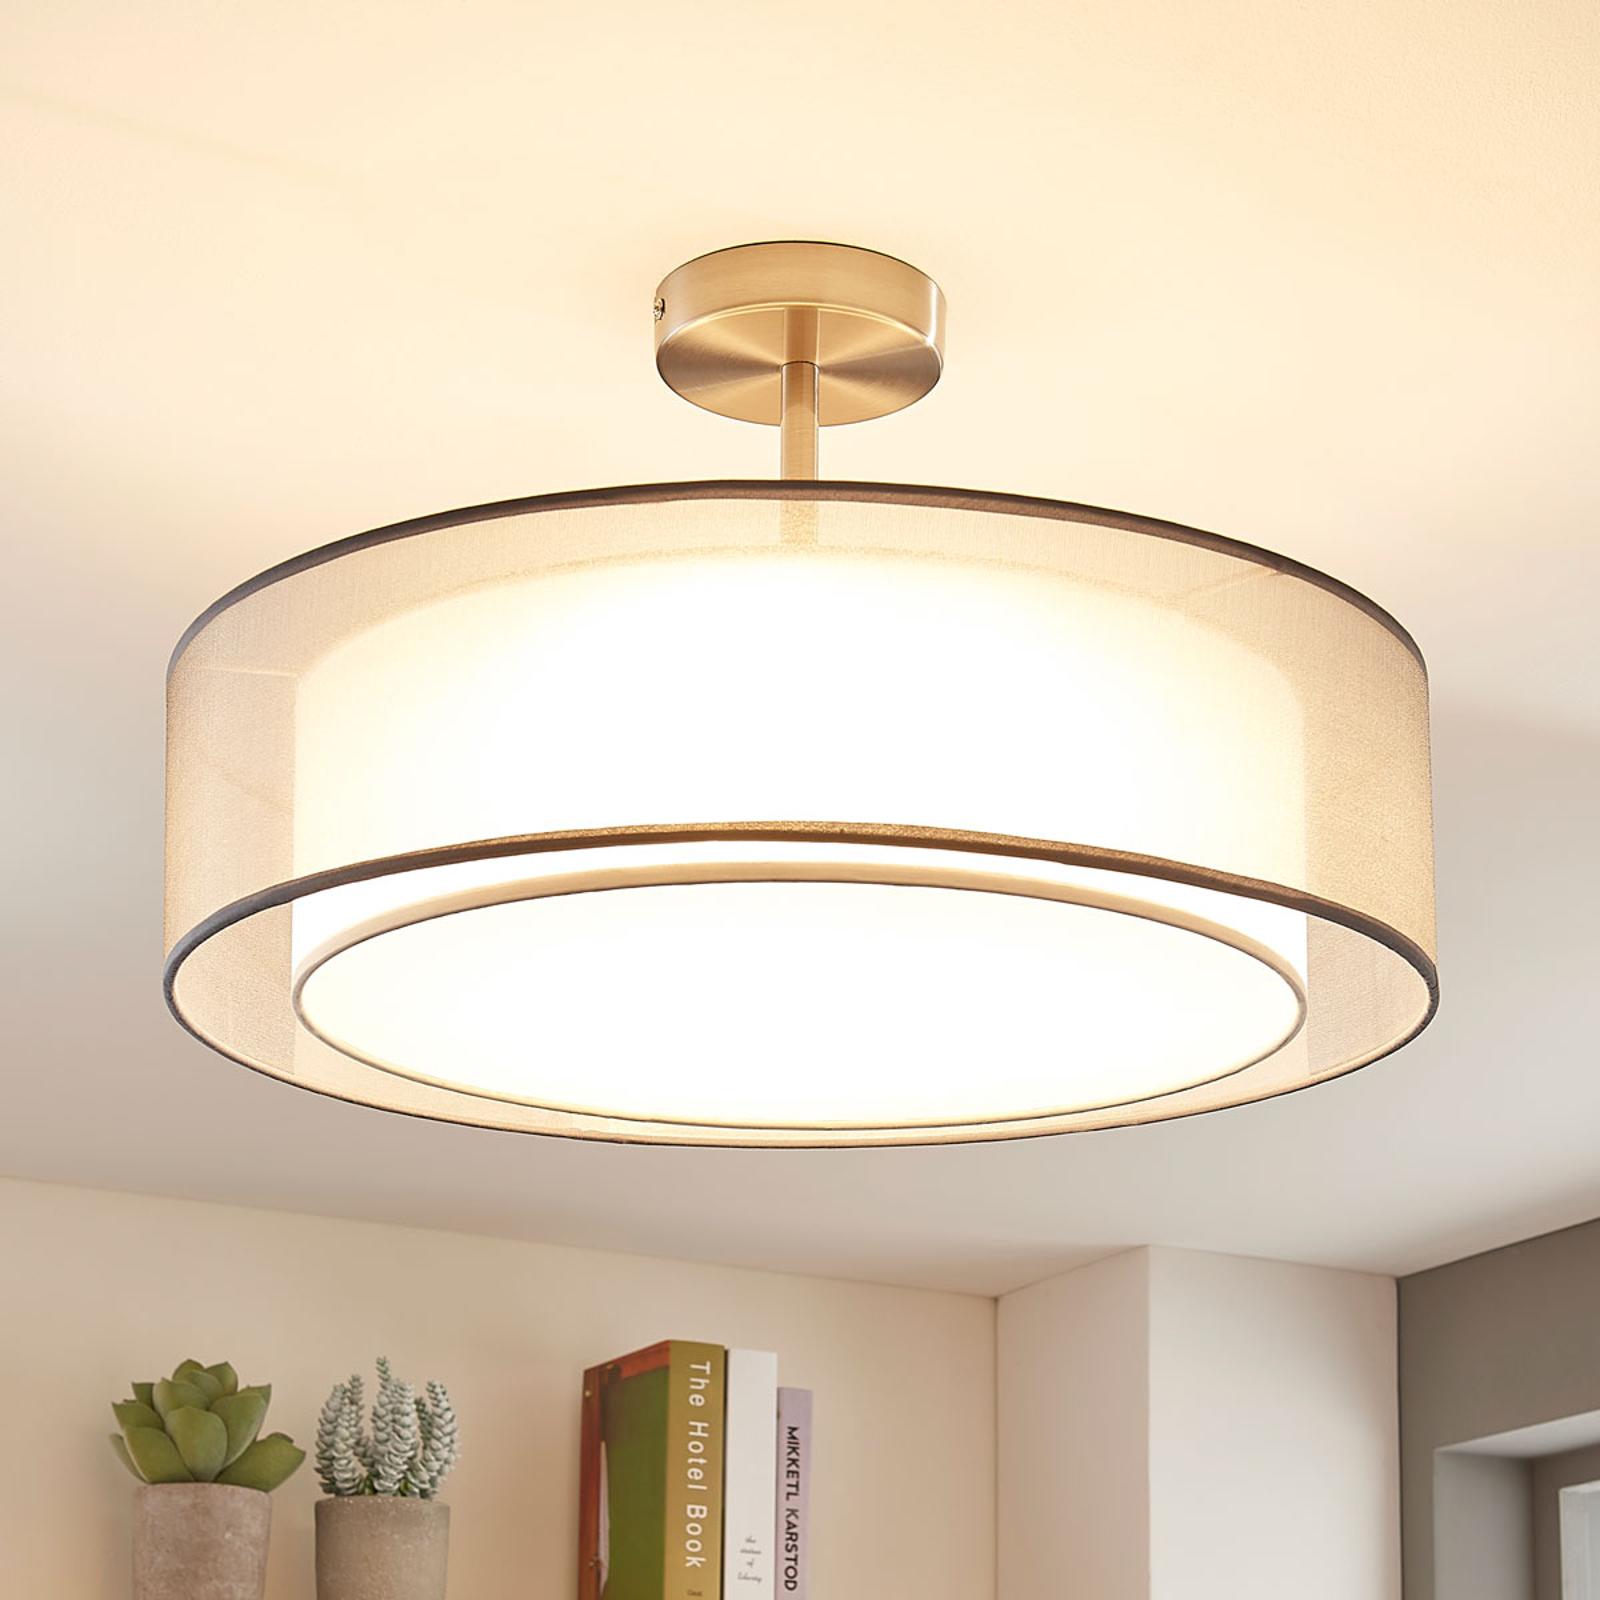 Pikka LED-loftlampe, 3 trin dæmpbar, grå